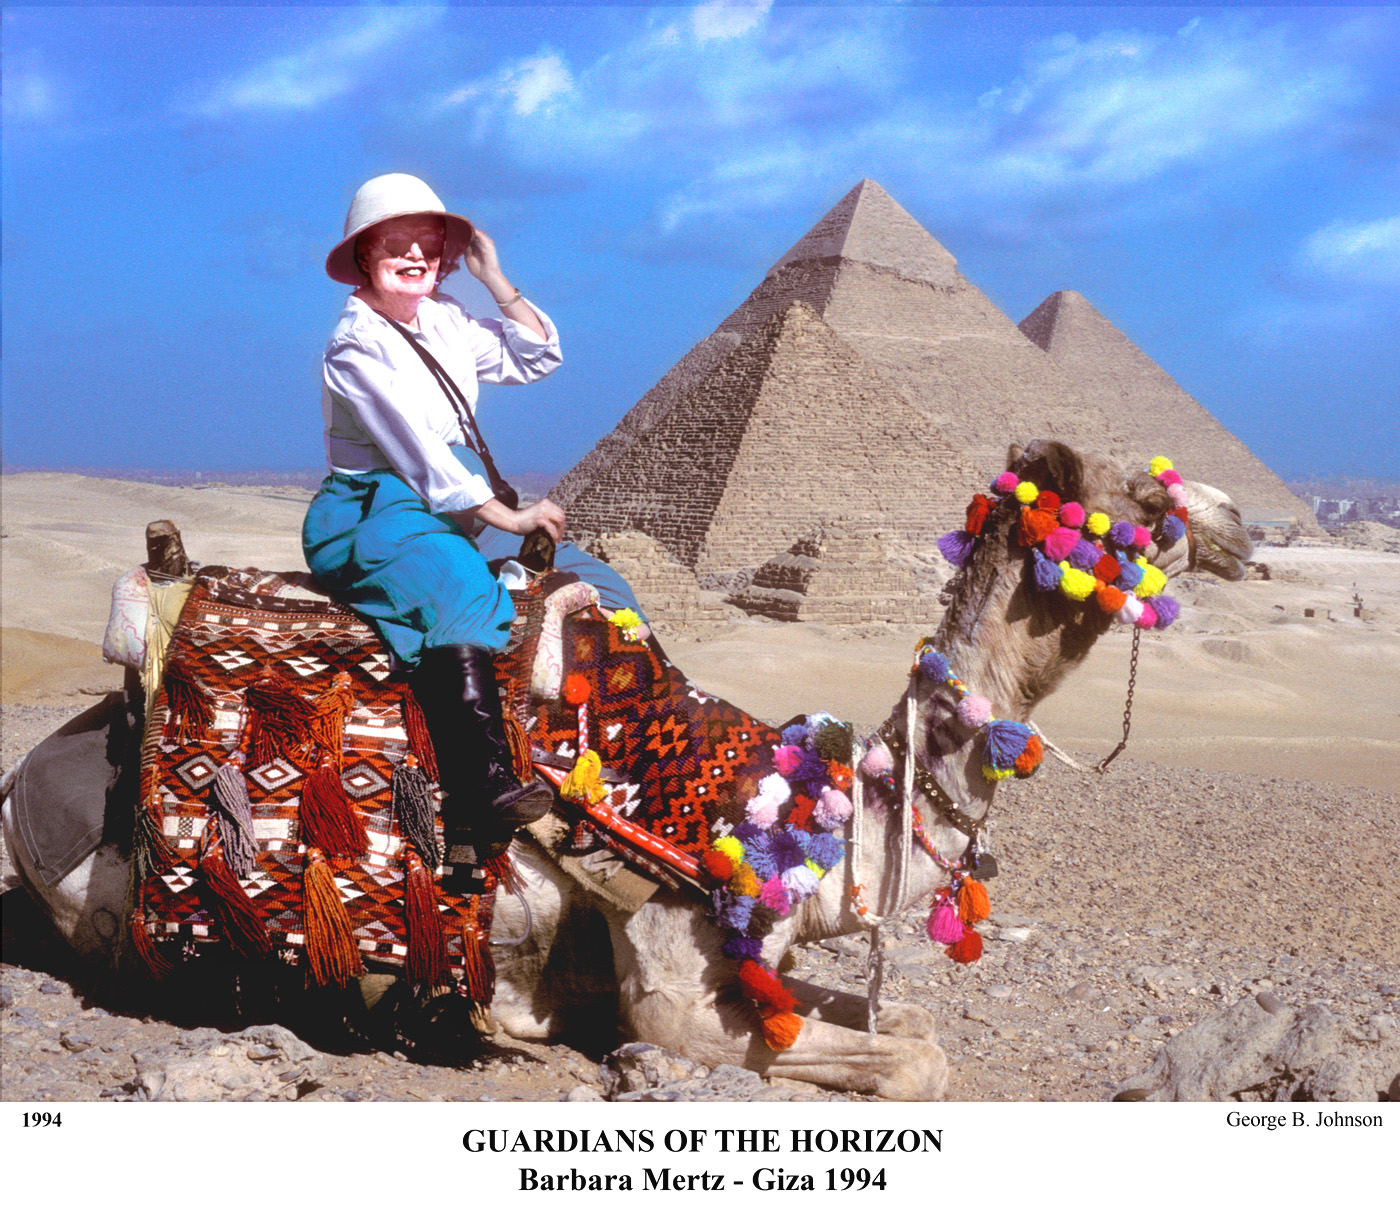 1a Barbara Mertz camel 1994 jpg